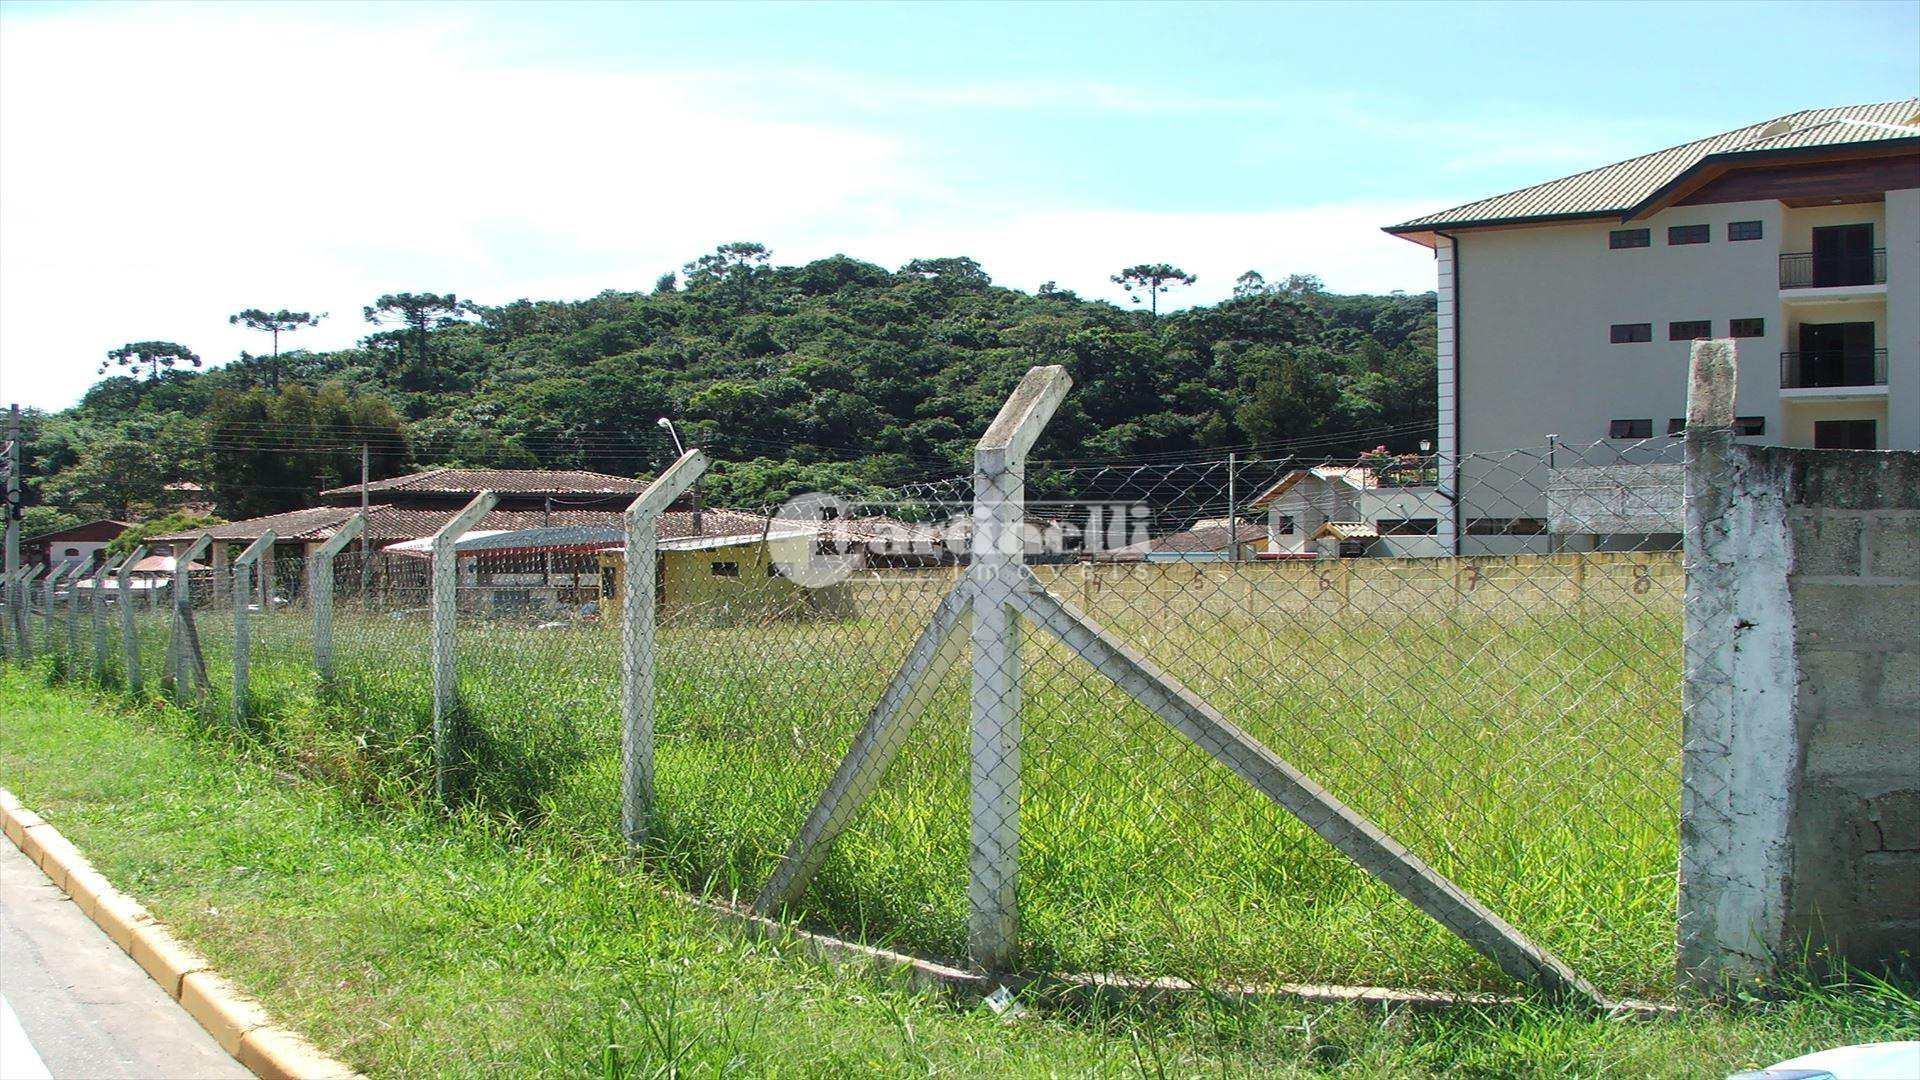 Terreno, Centro, Santo Antônio do Pinhal - R$ 1.7 mi, Cod: 578